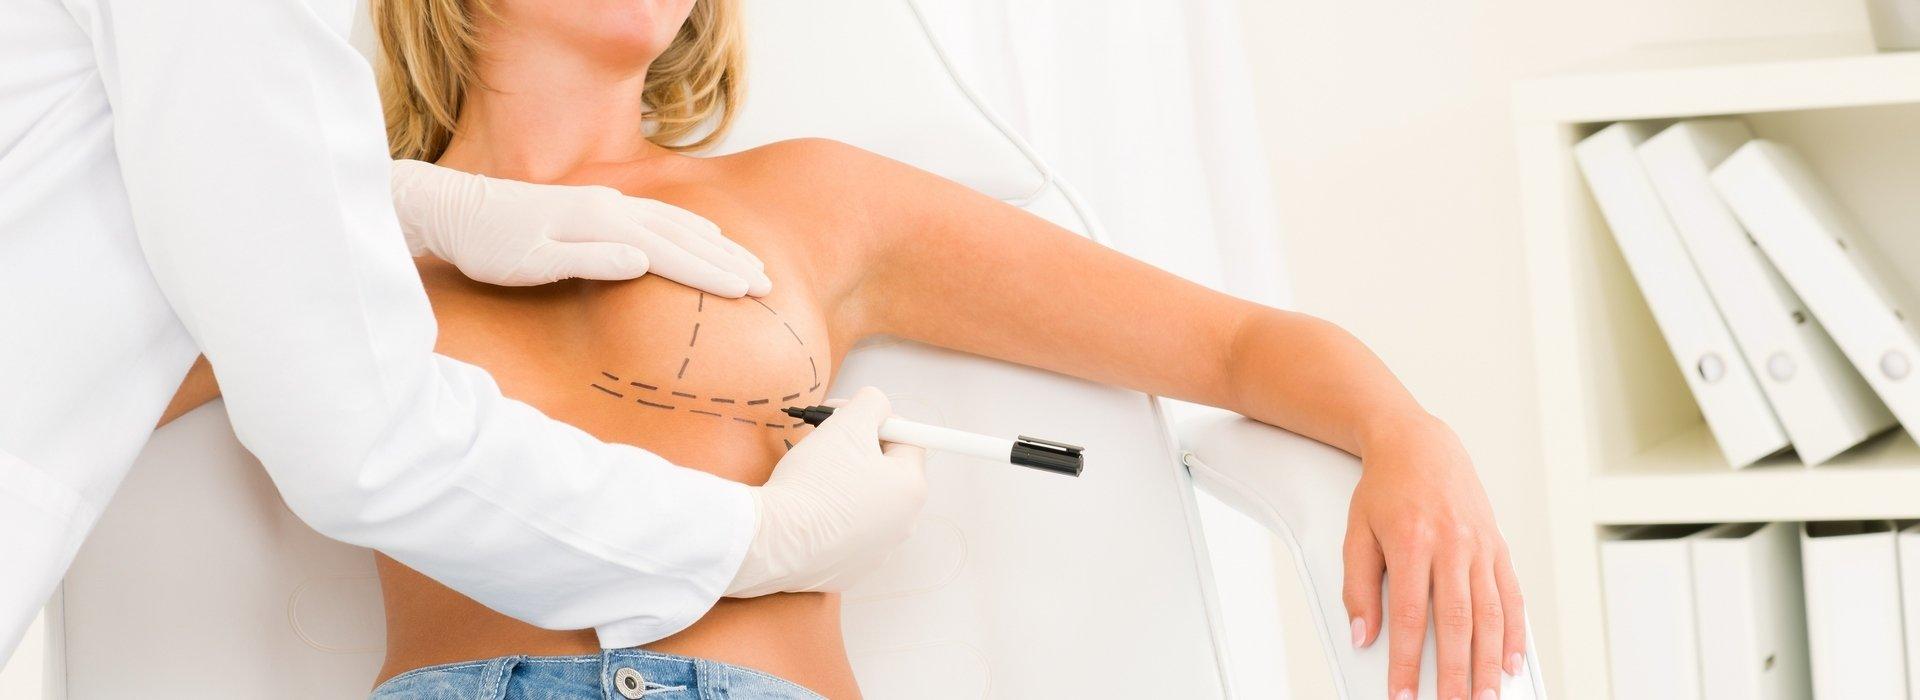 Brustplastik in Budapest – Günstige Brustplastik Budapest